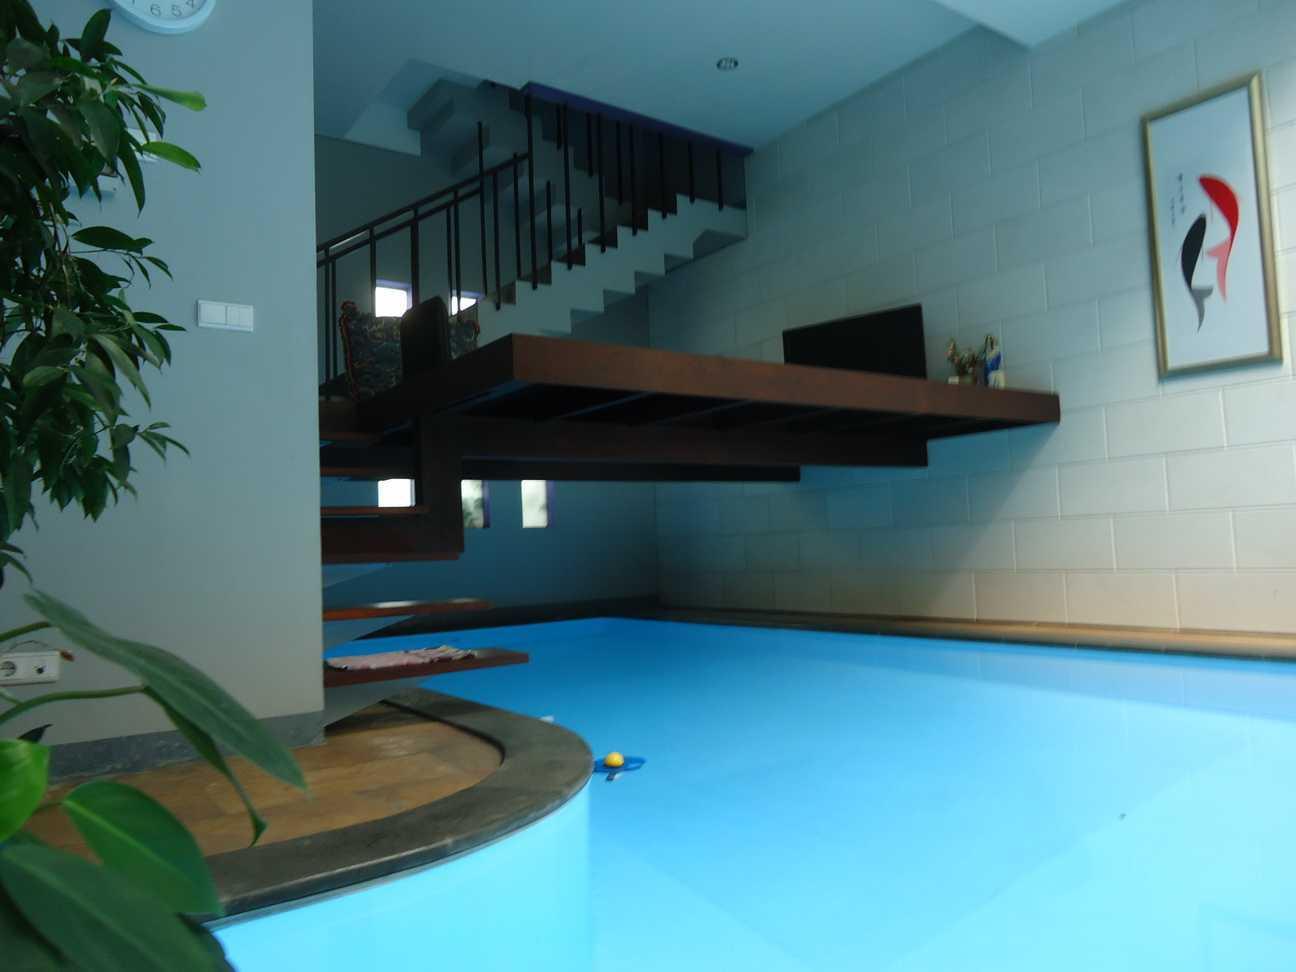 Budi Dharma The Relaxation House Gelong Selatan - Tomang Gelong Selatan - Tomang Gelong-Selatan-08   23857